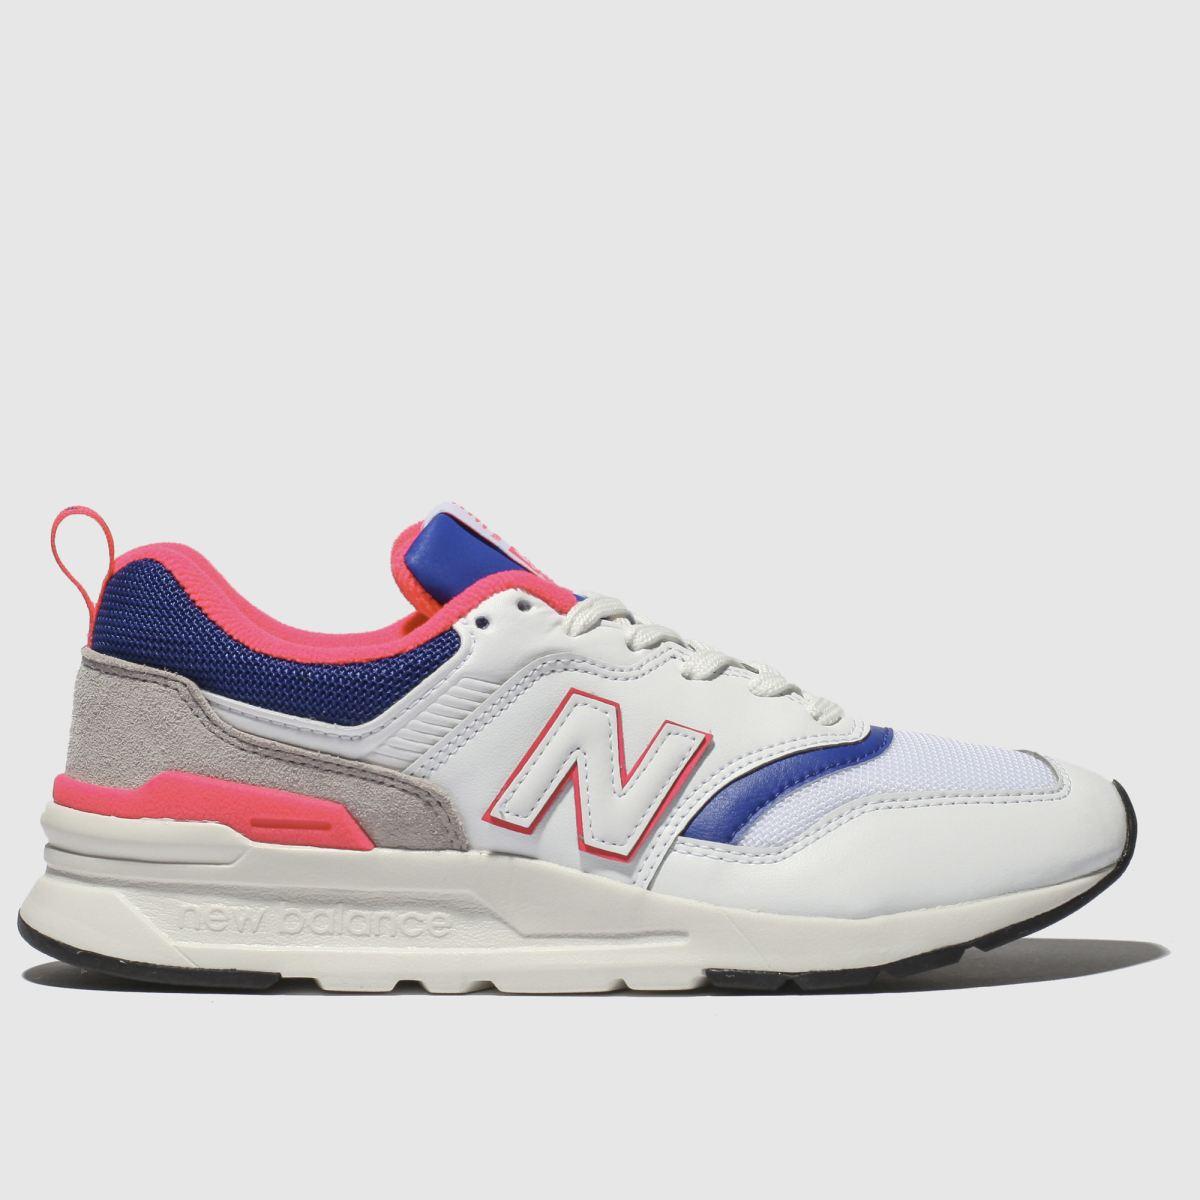 New Balance White & Blue 997 Trainers